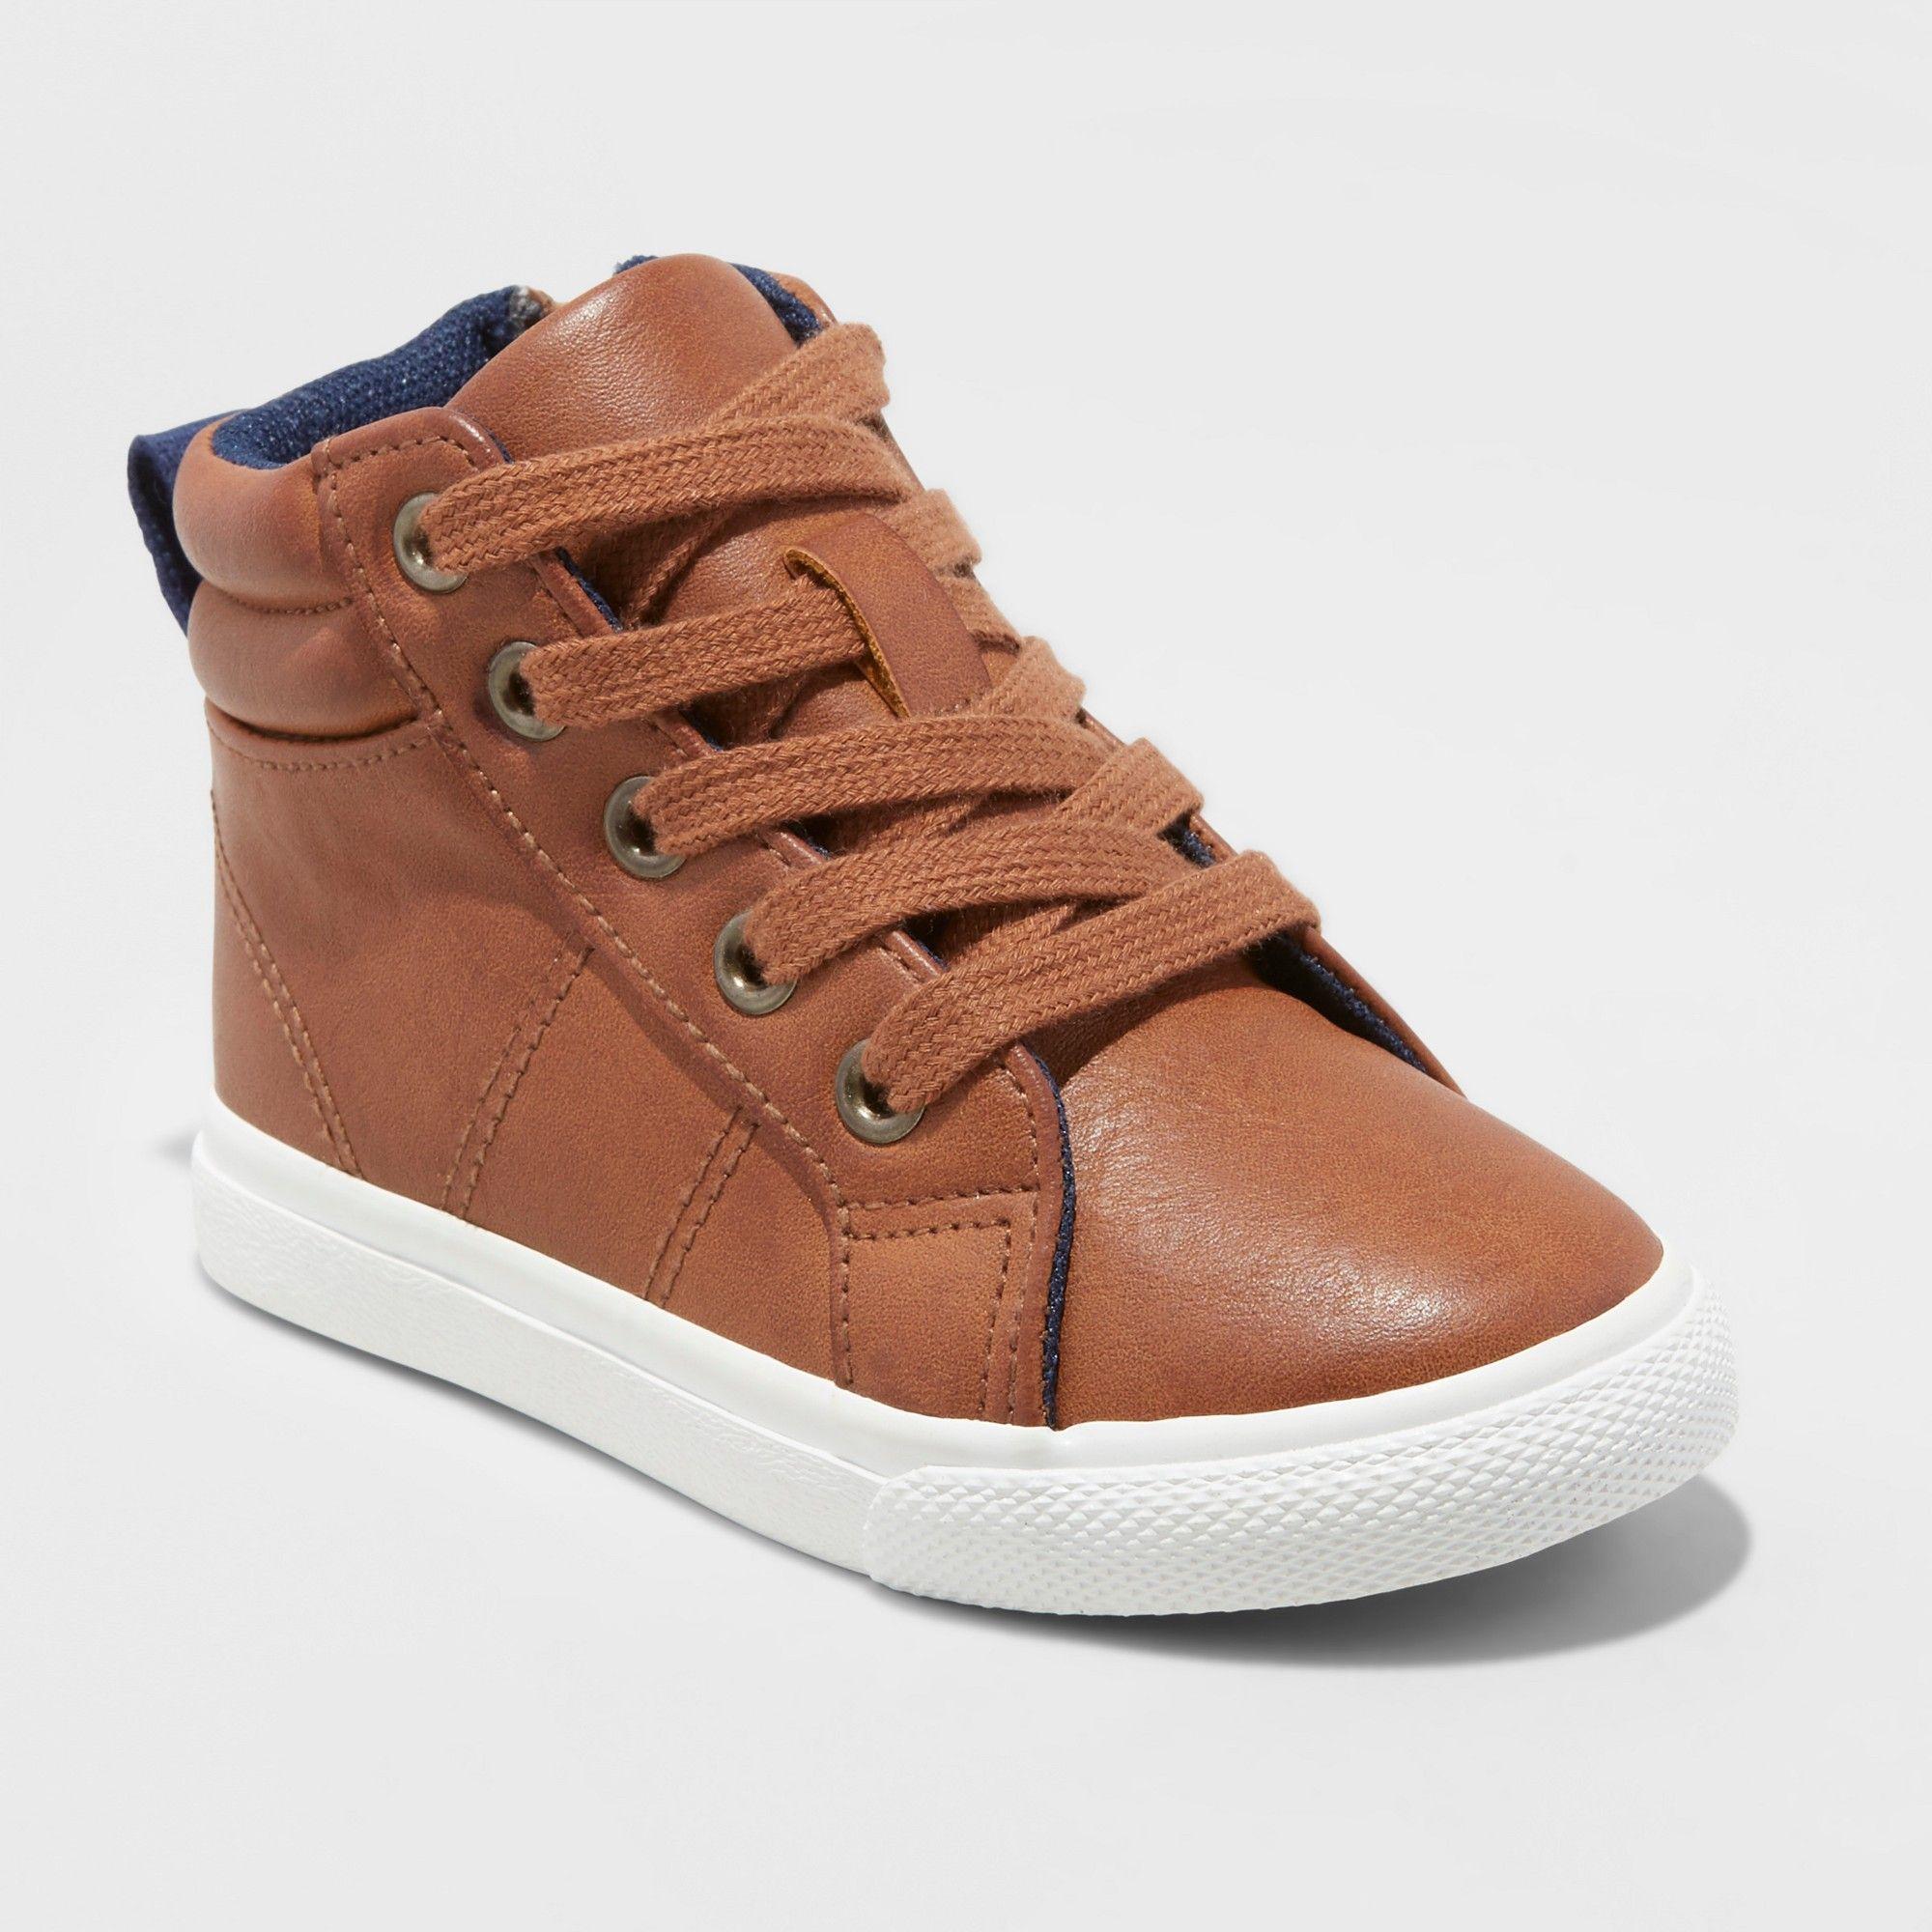 Toddler Boys' Cayden Casual Sneakers